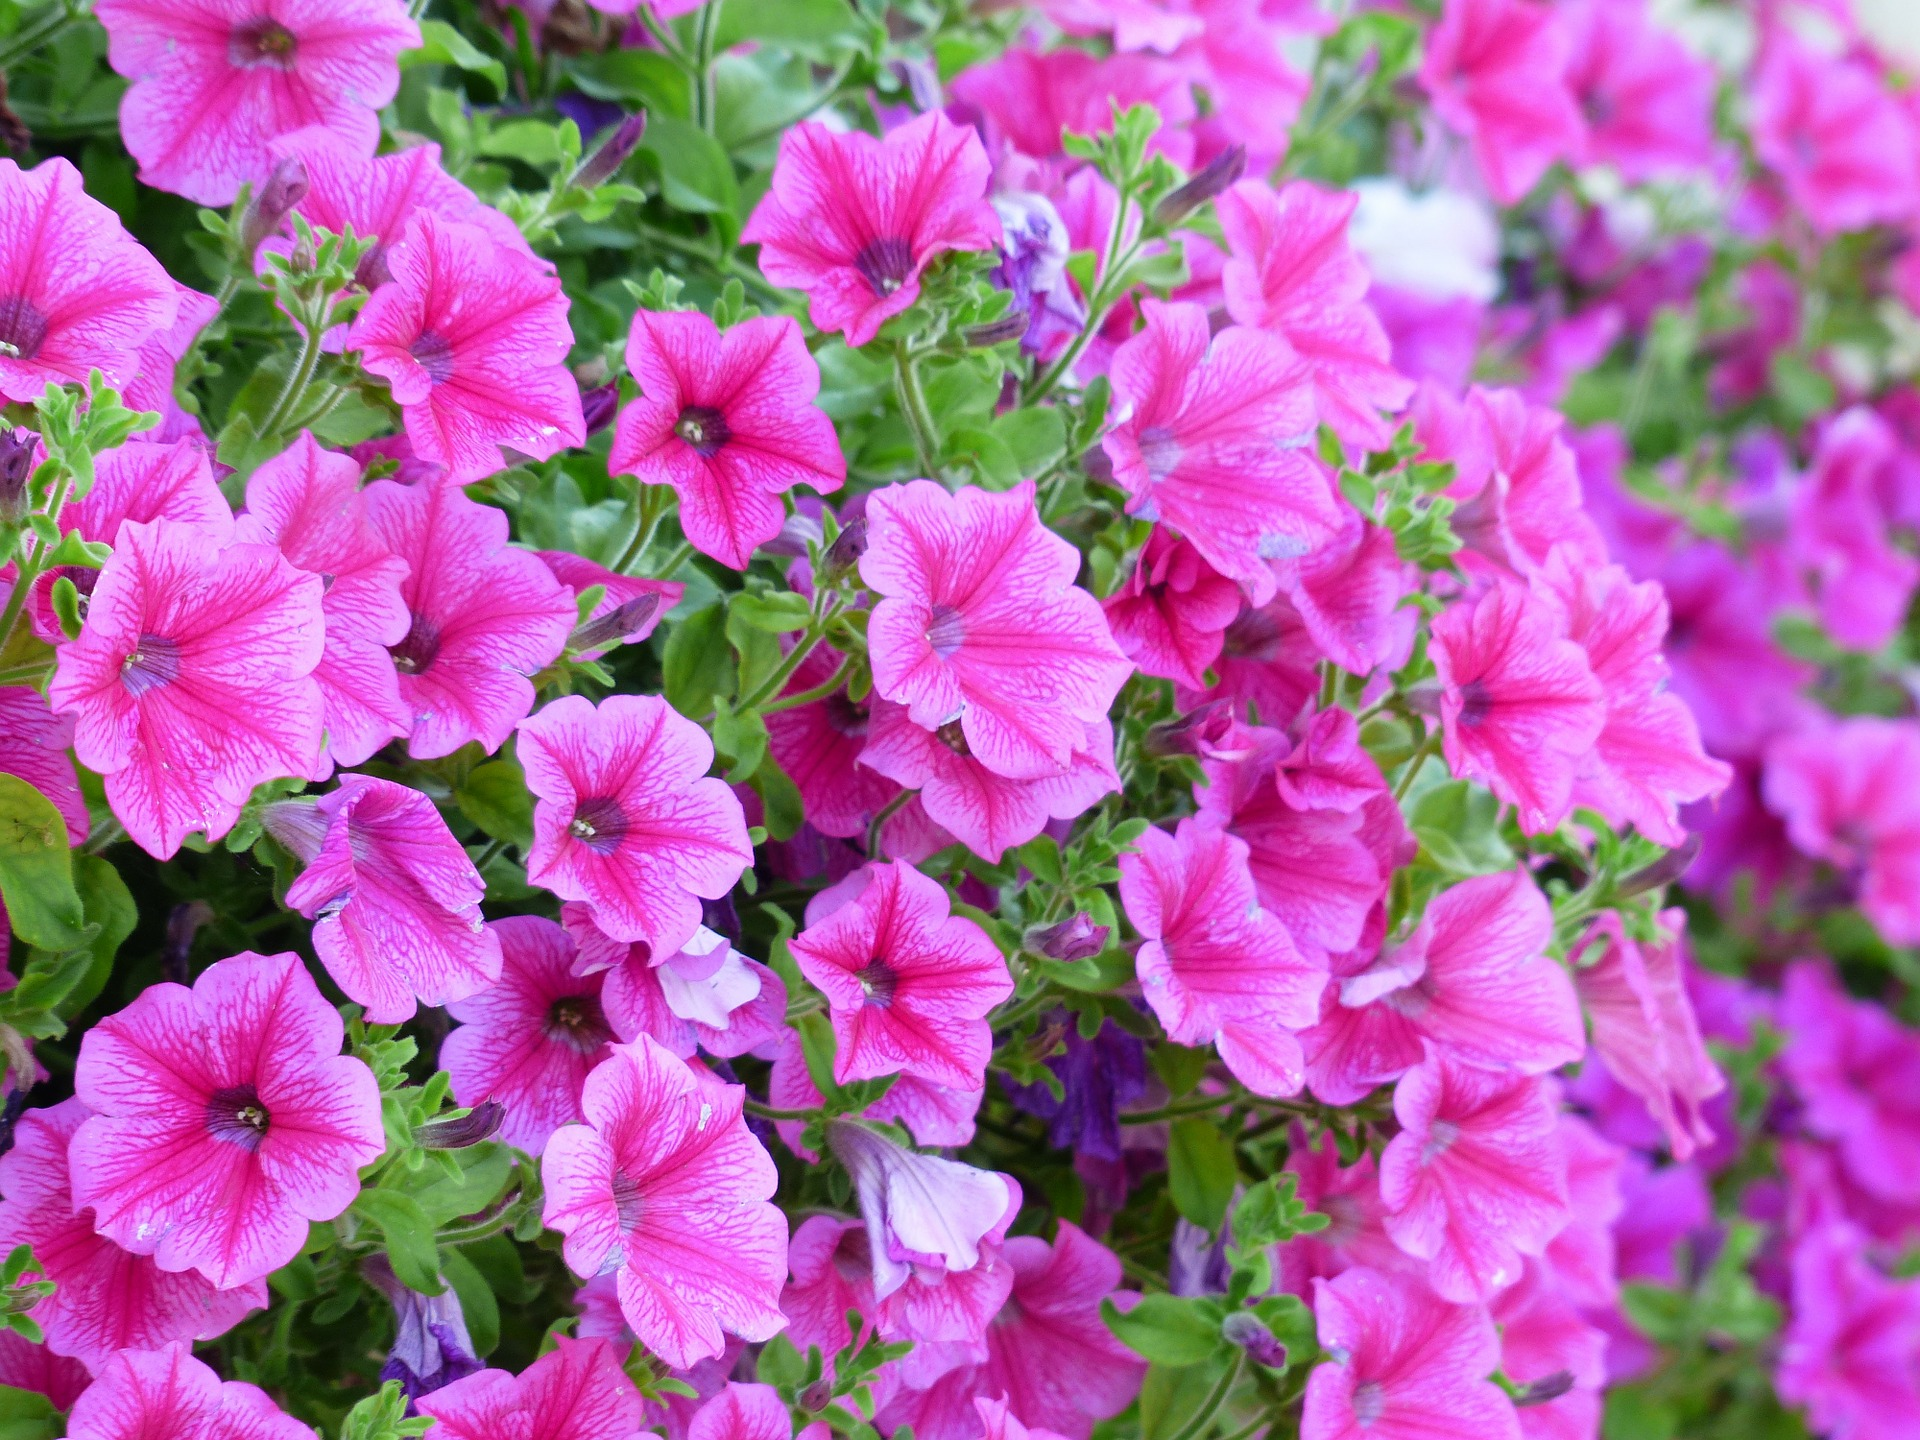 planta colgante petunia